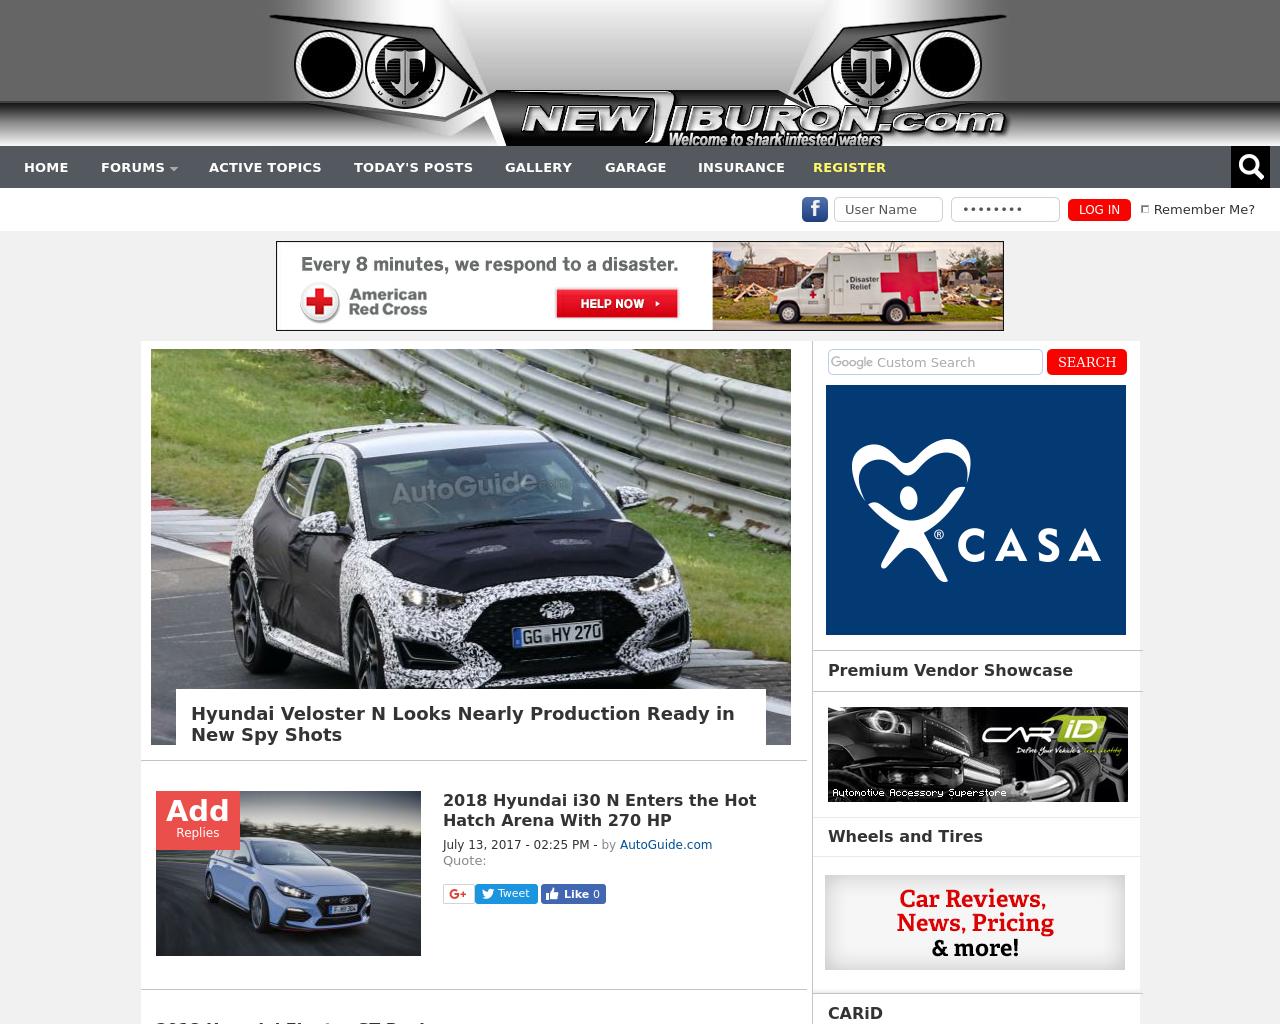 New-Tiburon-Advertising-Reviews-Pricing